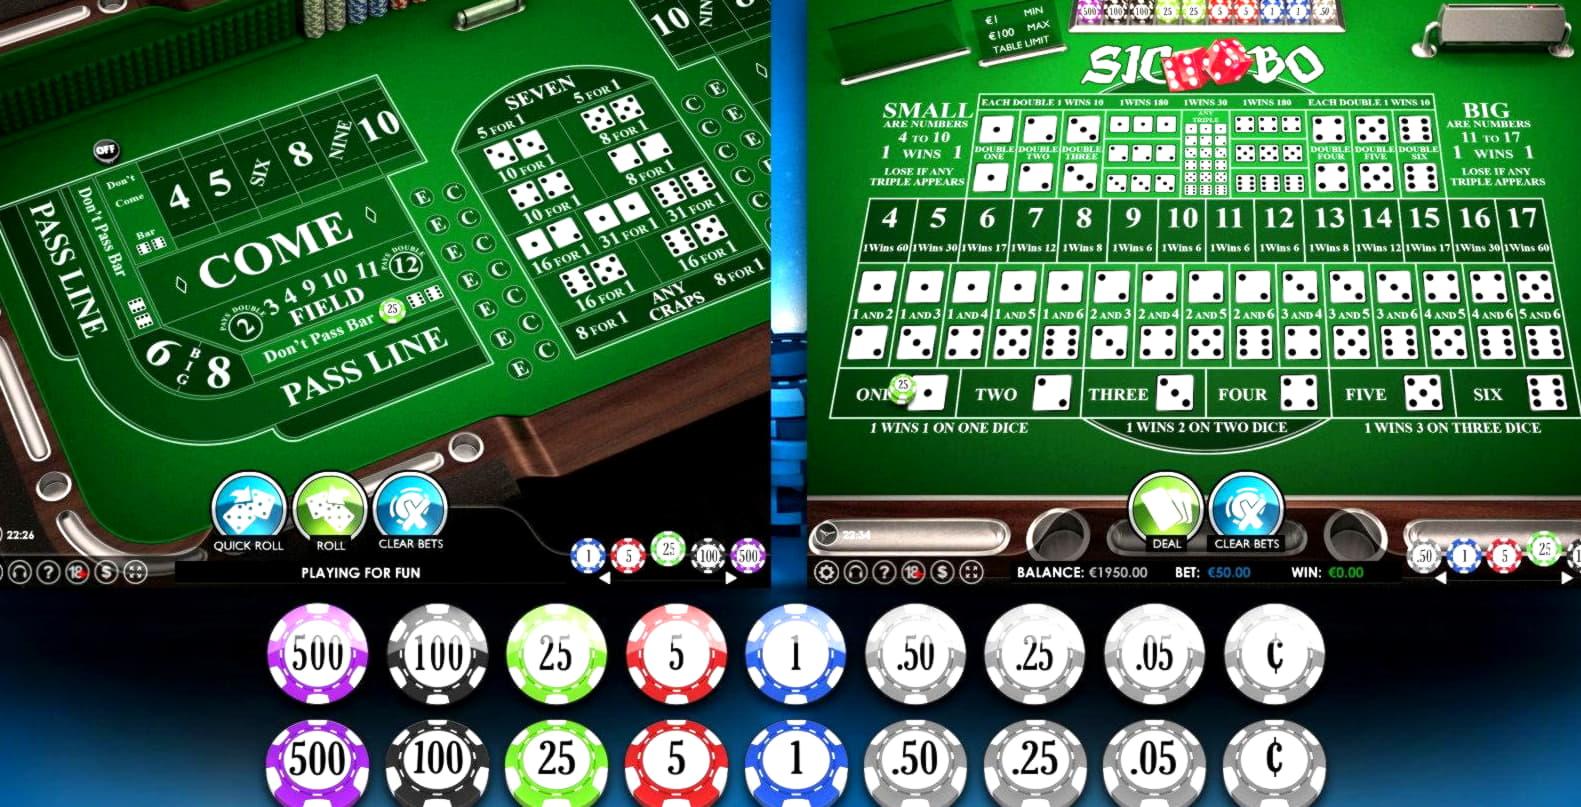 110 Free spins no deposit casino at Jackpot City Casino